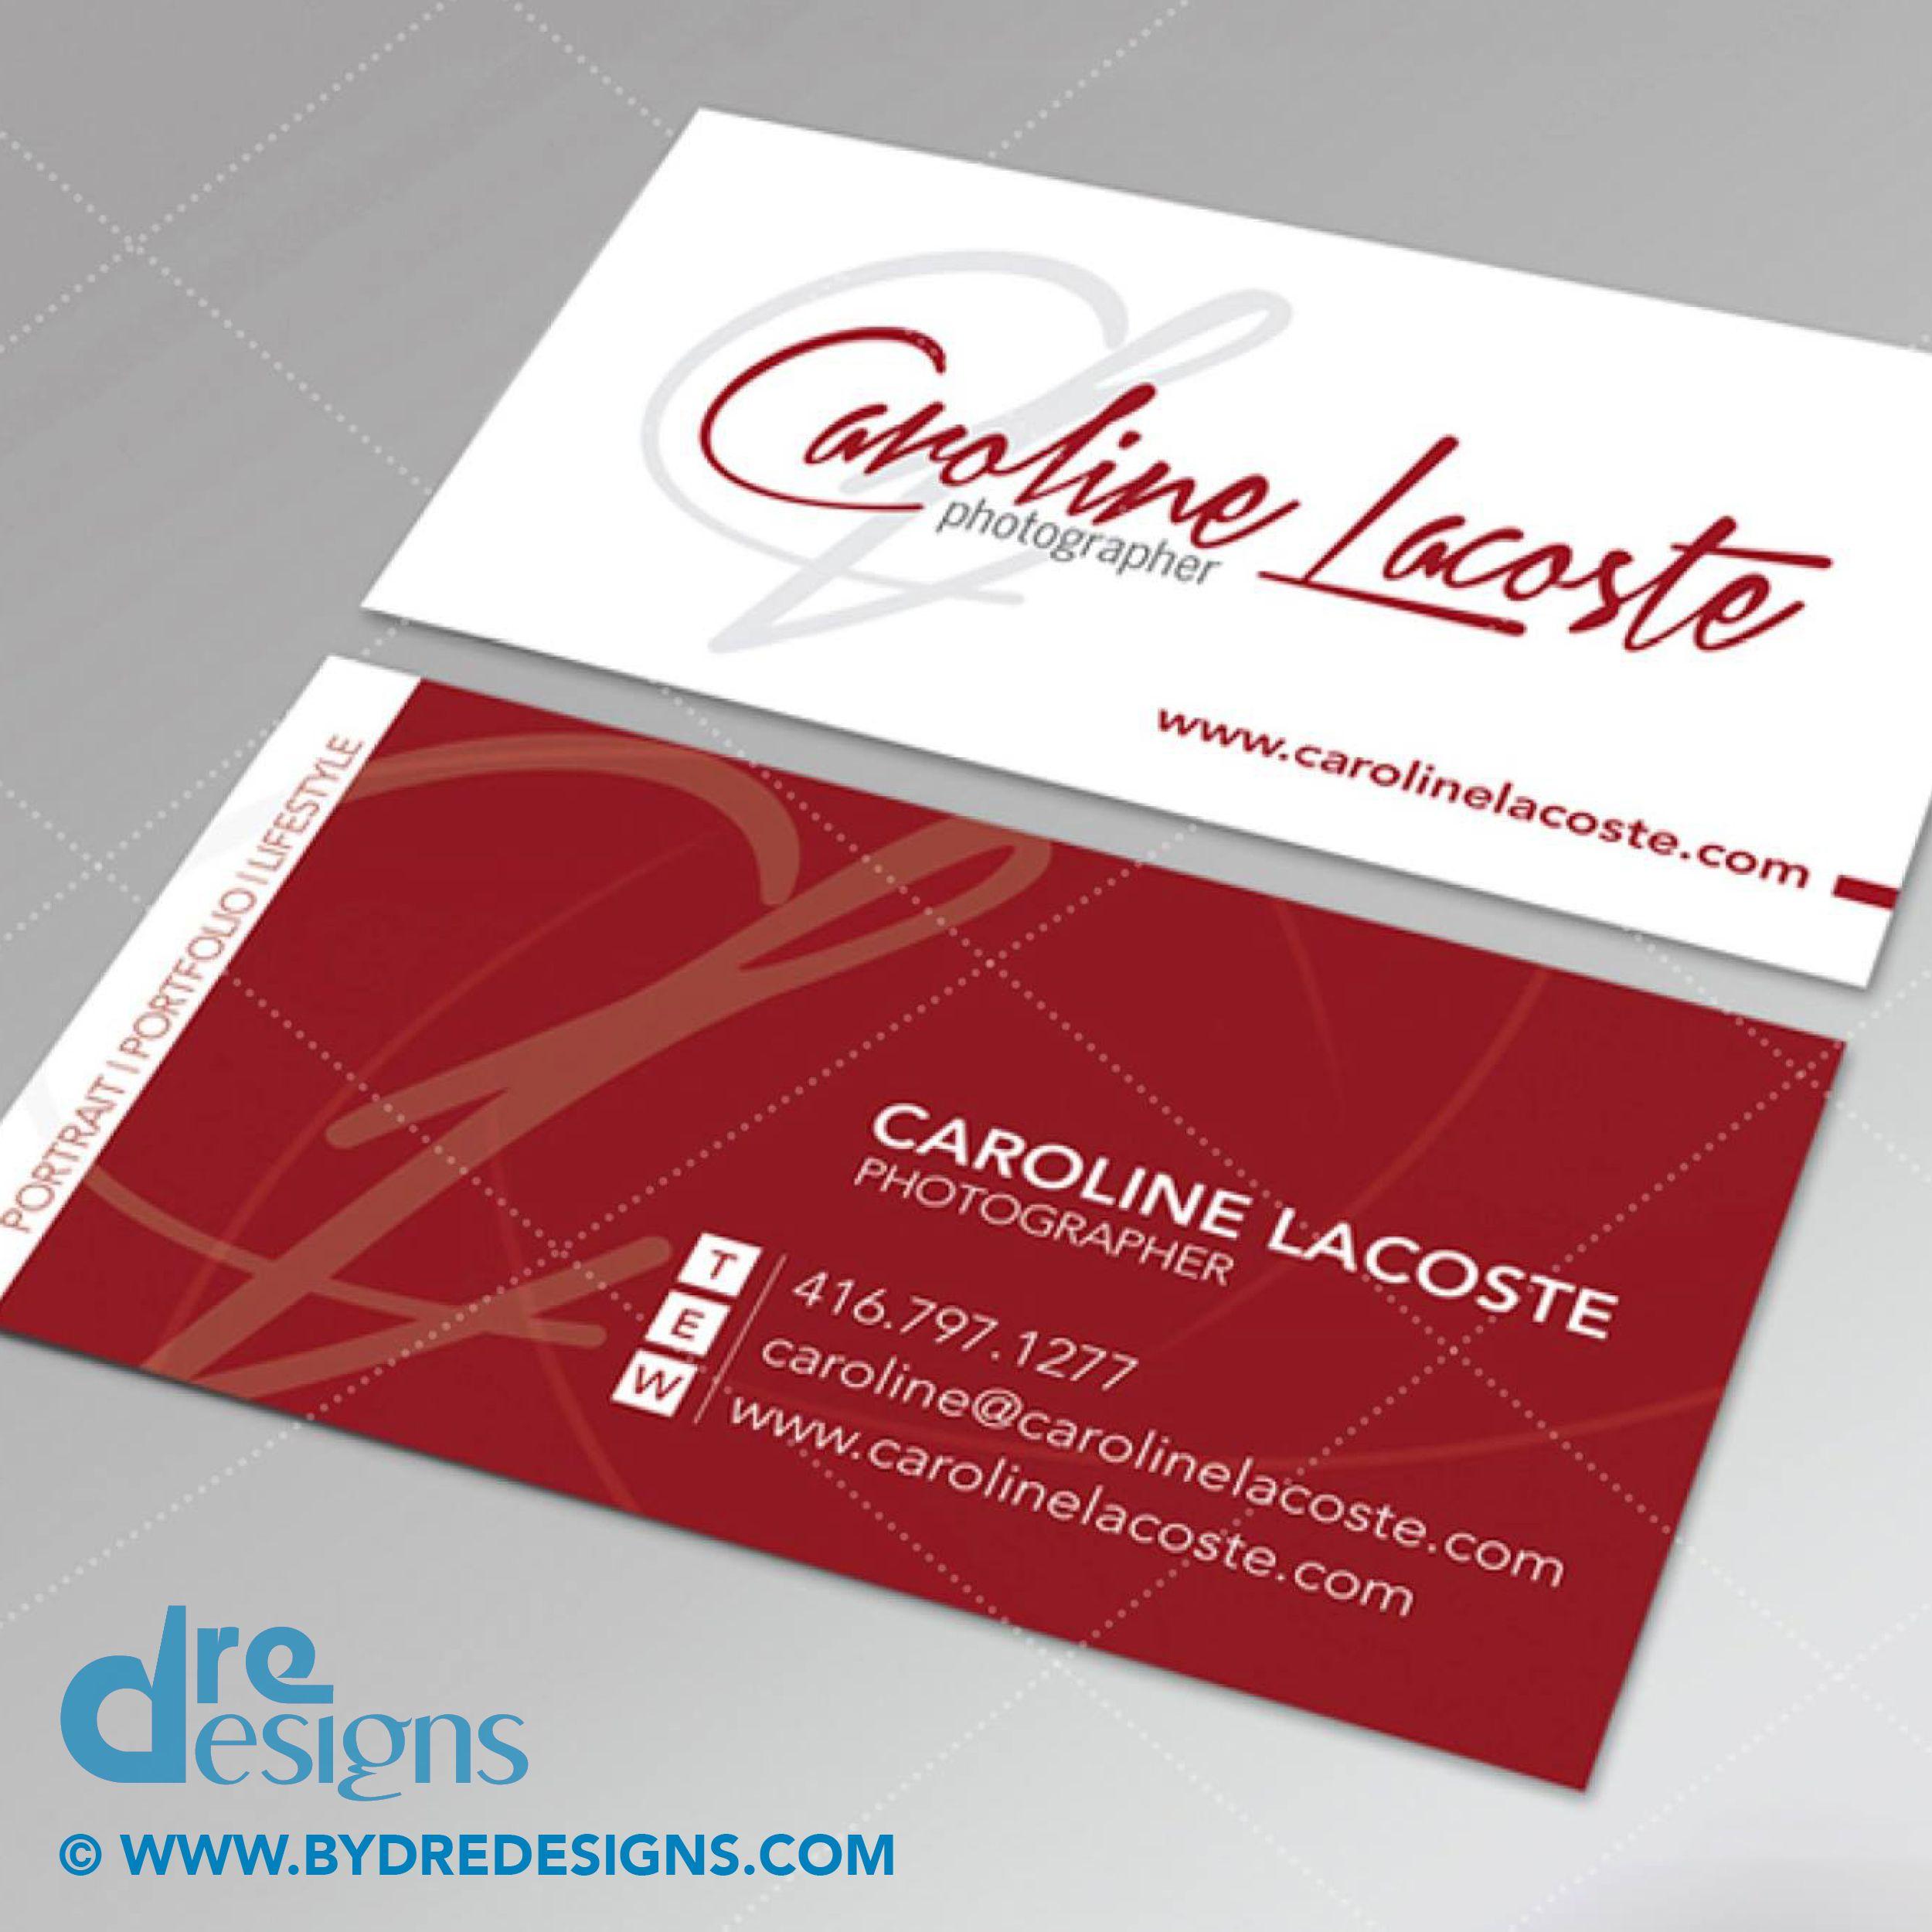 Logo Business Card Design Print For Photographer Caroline Lacoste Dredesigns Businesscard Busin Freelance Graphic Design Business Card Design Card Design